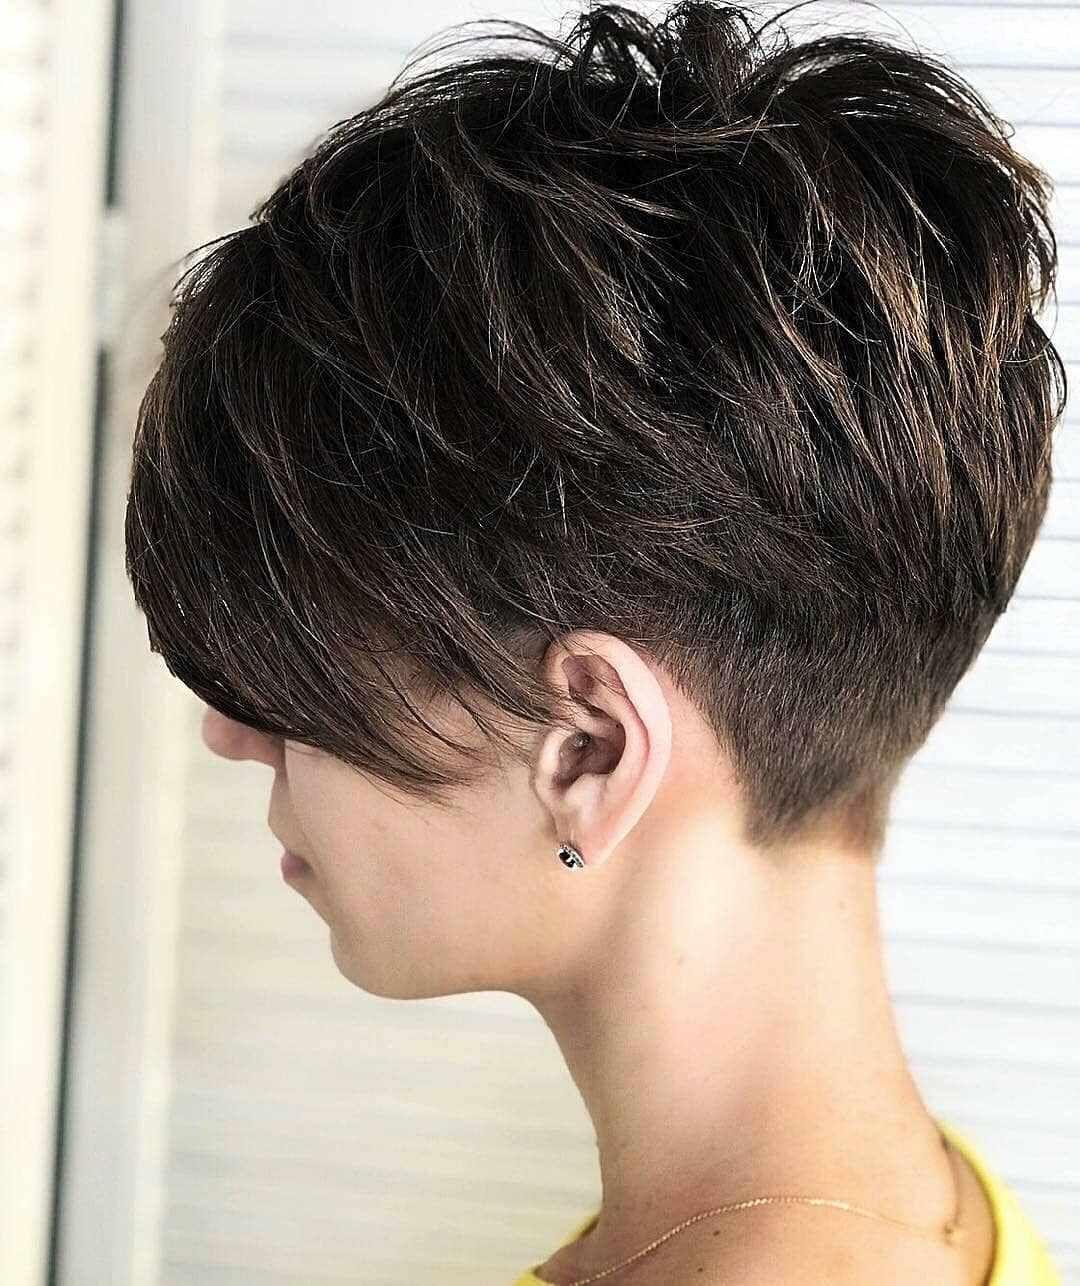 Best Short Haircuts For Men Http Www 99wtf Net Men Popular Short Length Hairstyles Men Mens Haircuts Fade Mens Hairstyles Short Thick Hair Styles